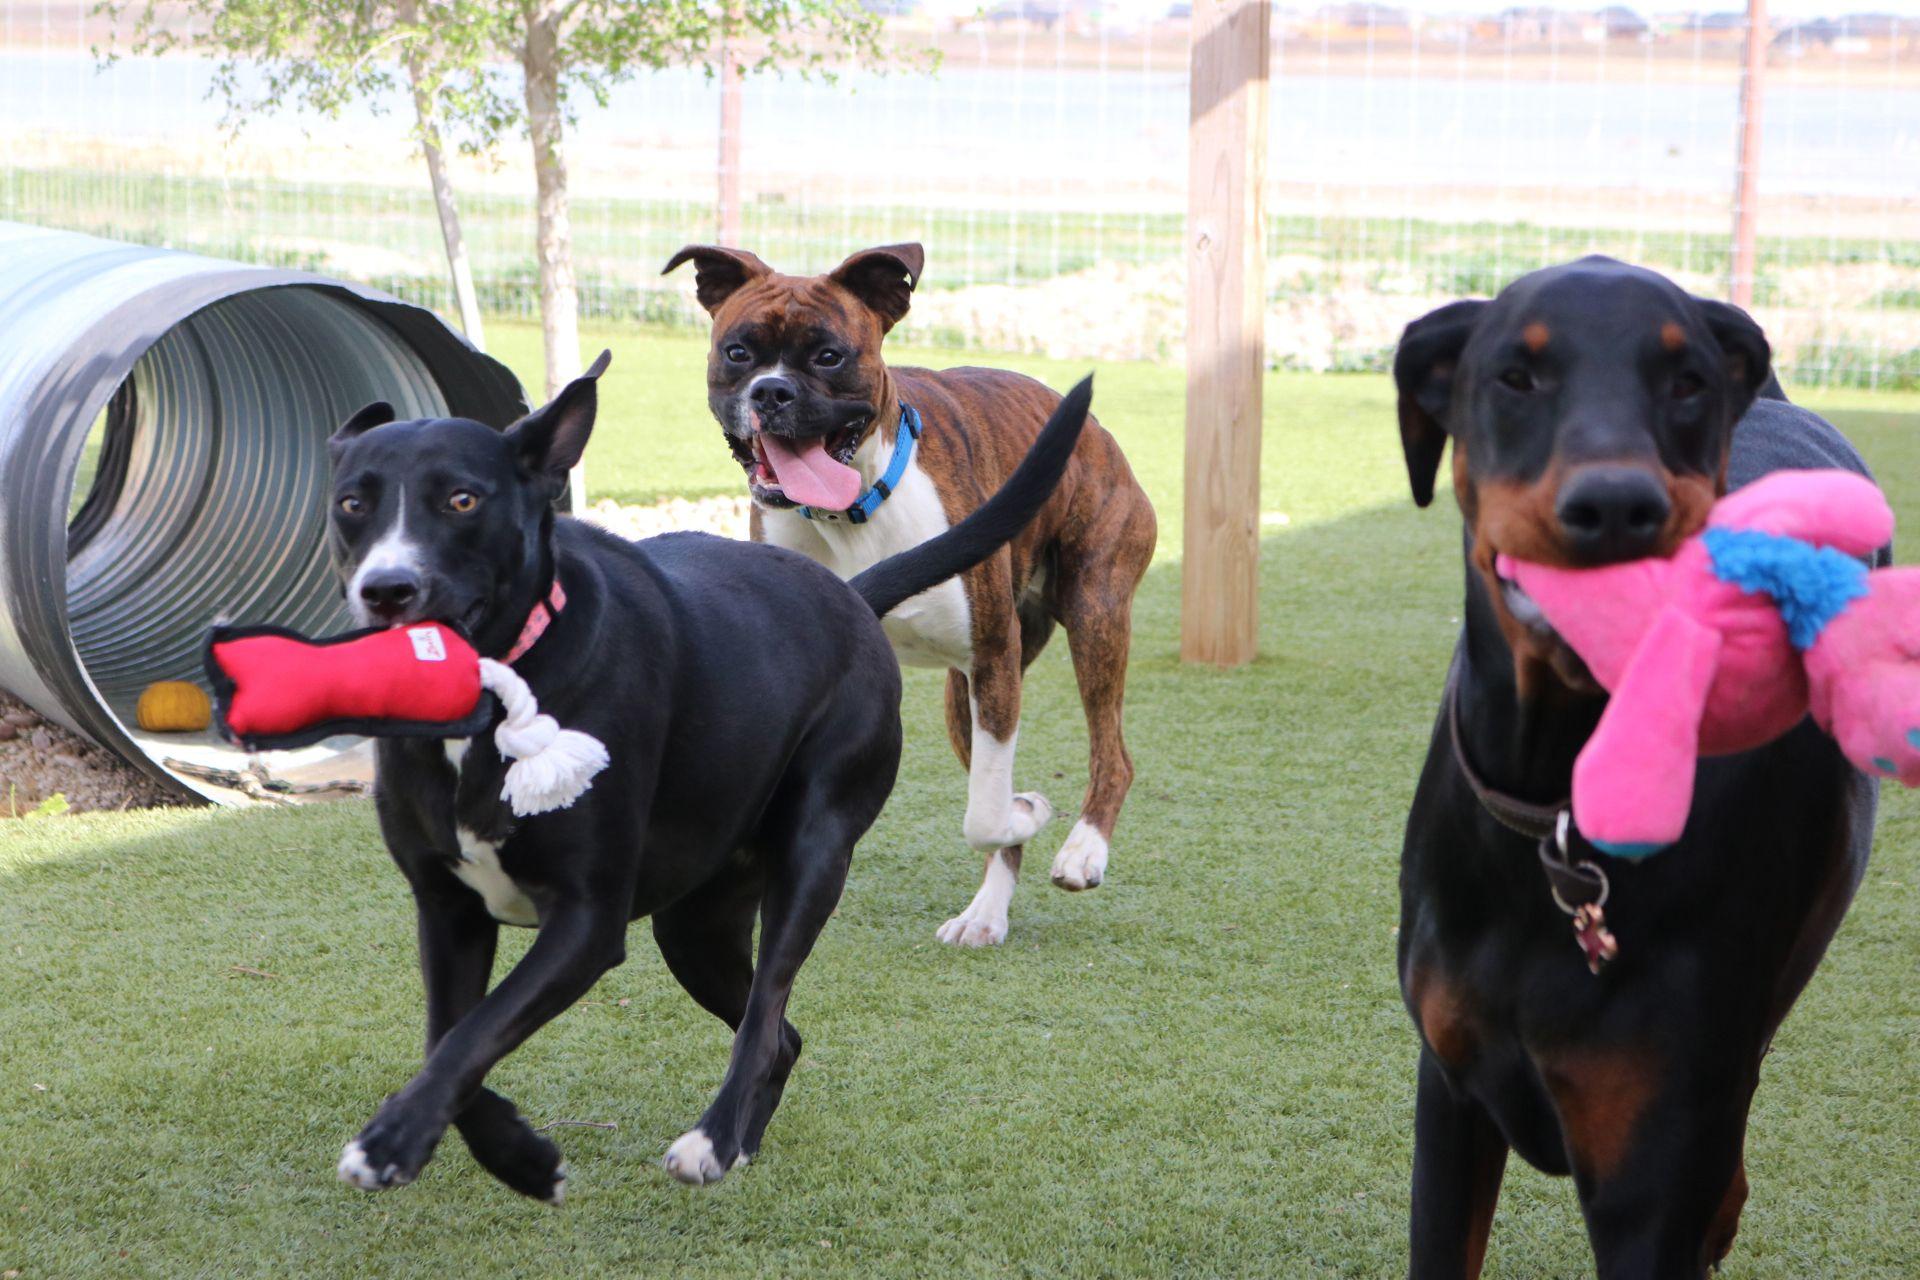 Le Chateau Pet Resort Featured Project Pet Resort Pet Boarding